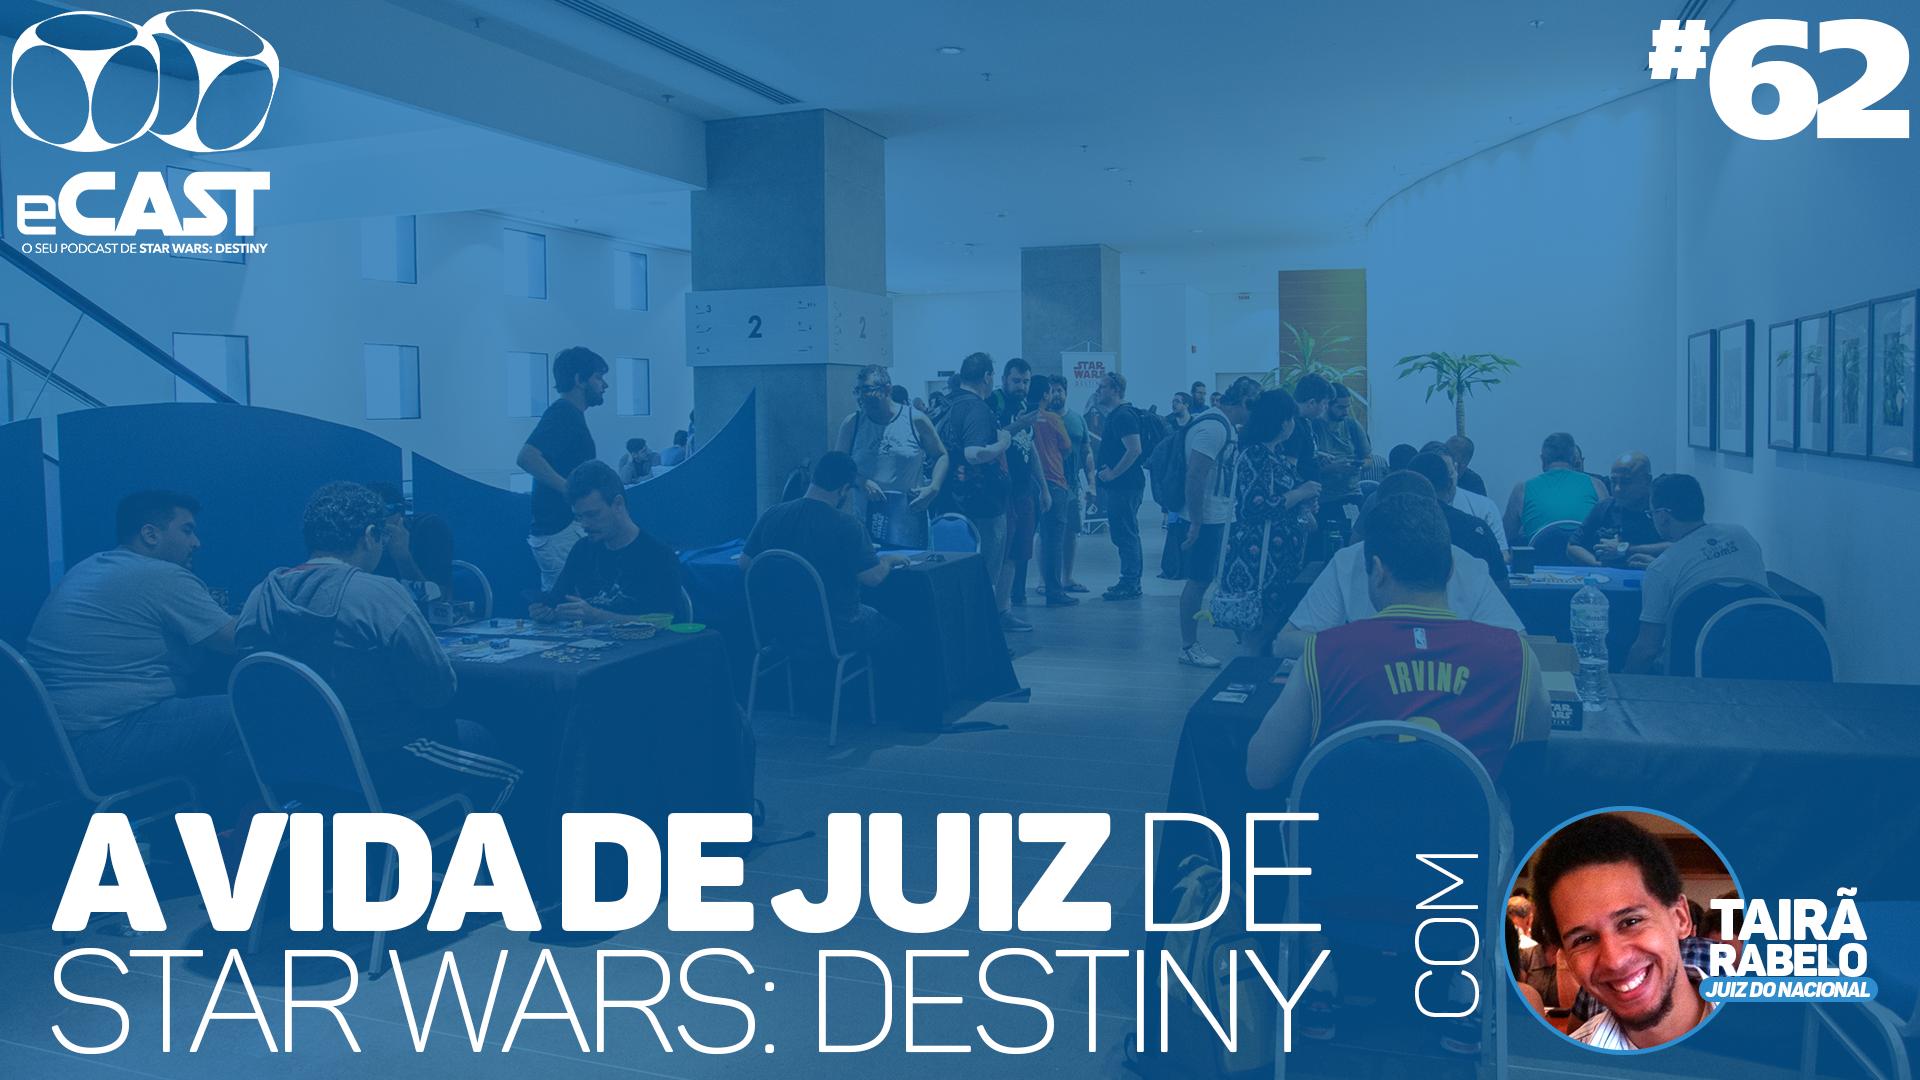 eCast 62 – A vida de juiz de Star Wars: Destiny, com Tairã Rabelo